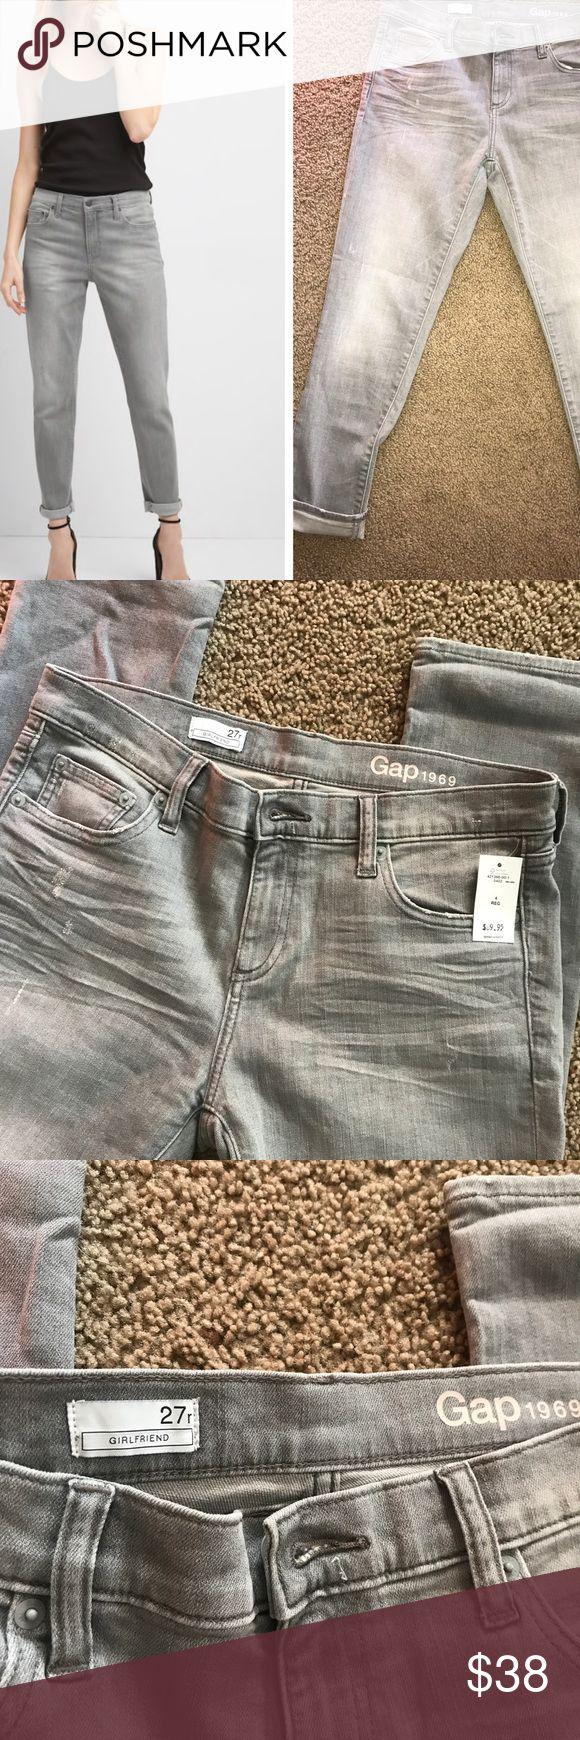 Selling this ⭐️ NWT GAP 1969 Girlfriend Jeans on Poshmark! My username is: hshae1. #shopmycloset #poshmark #fashion #shopping #style #forsale #GAP #Denim